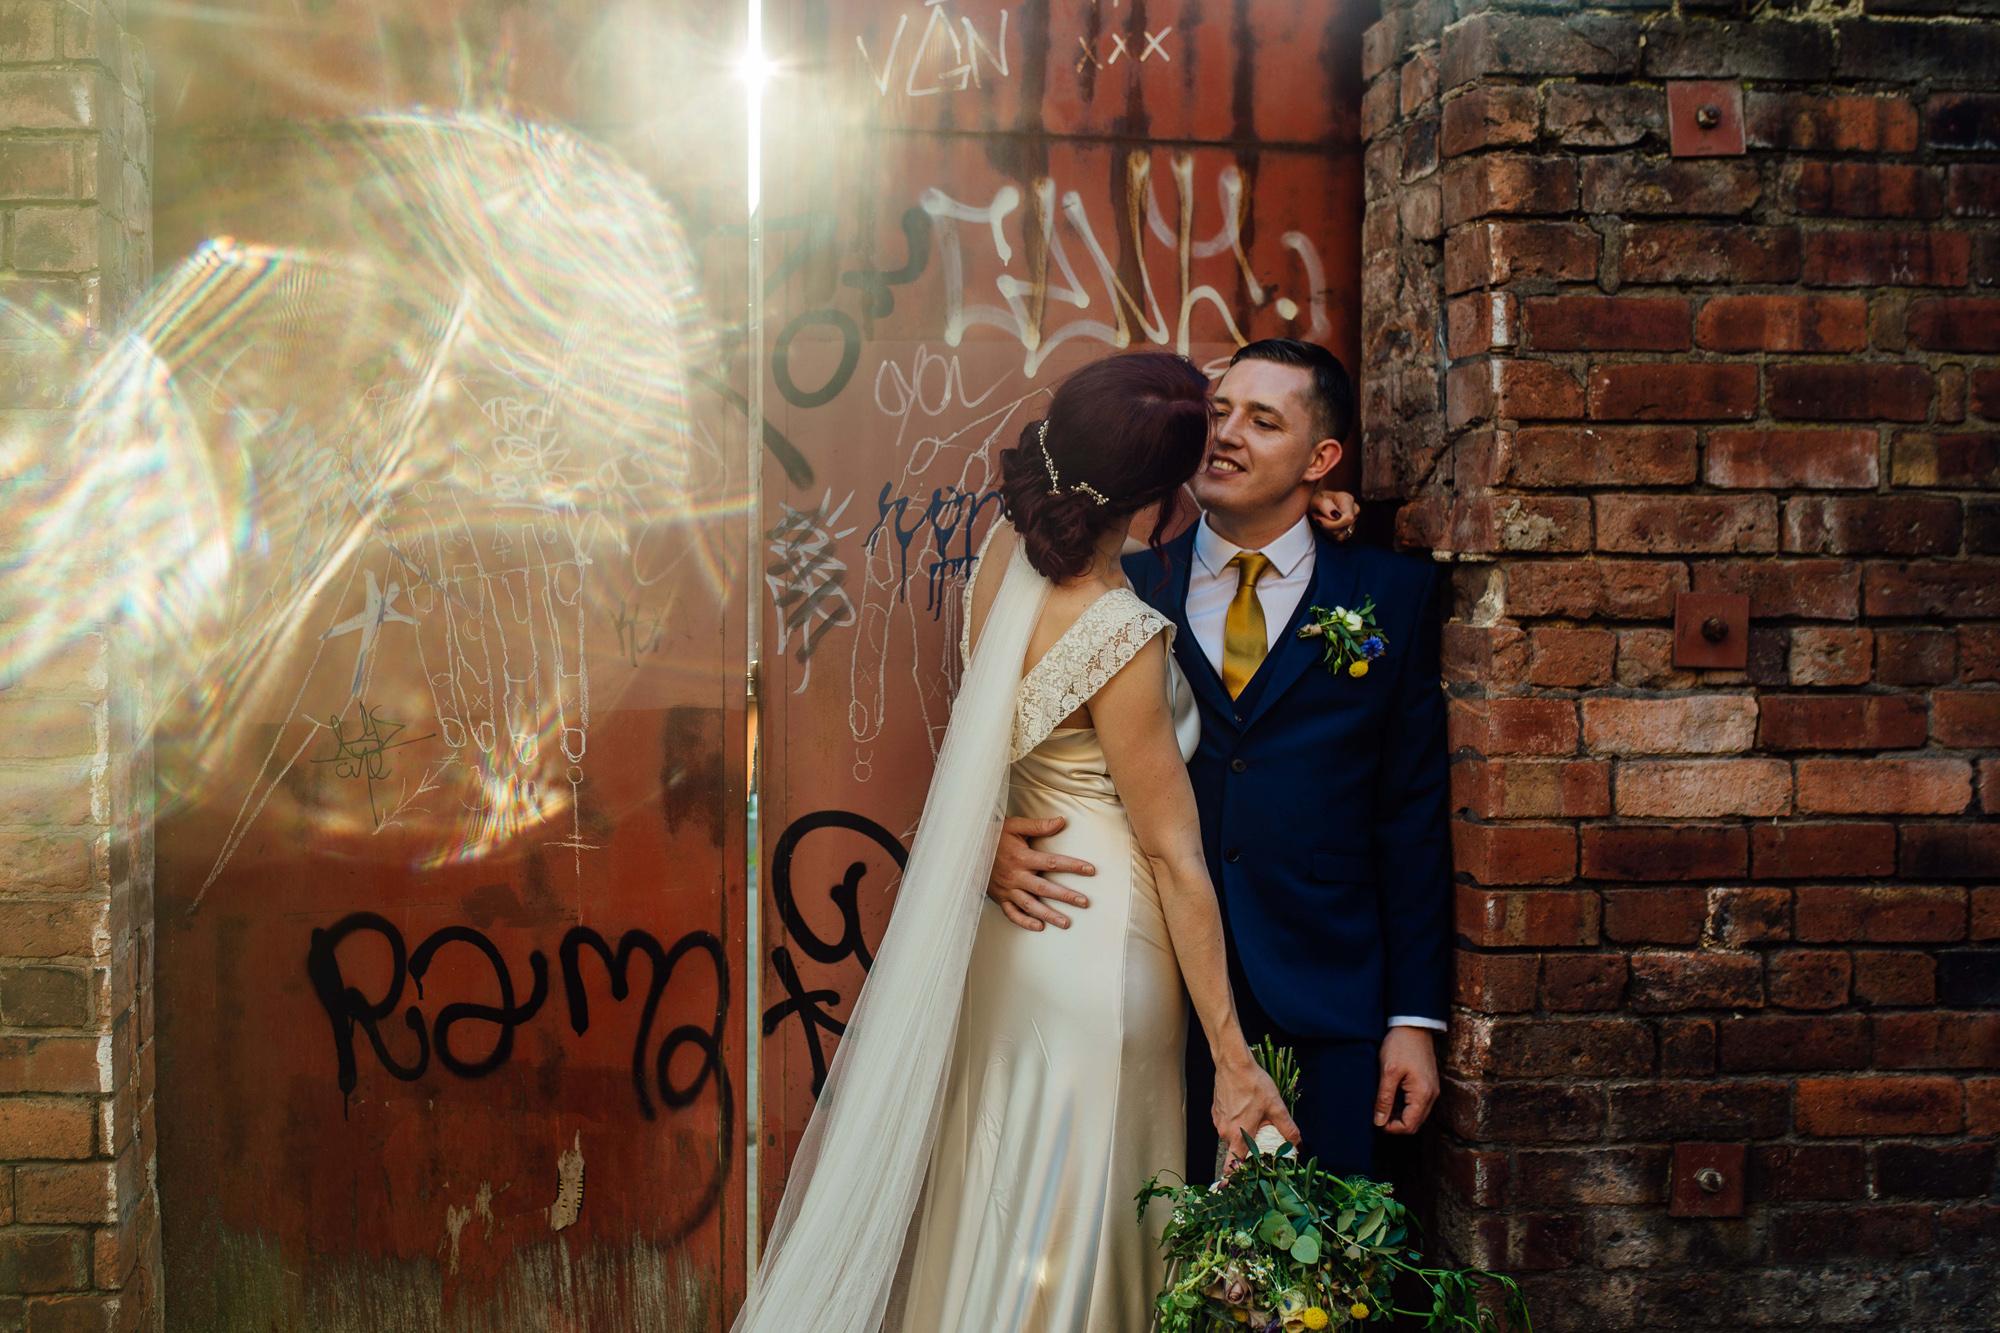 Sarah-Honeysuckle-Bias-Cut-Silk-Vintage-Inspired-Wedding-Gown-Sheffield-Wedding-Kate-Beaumont-58.jpg